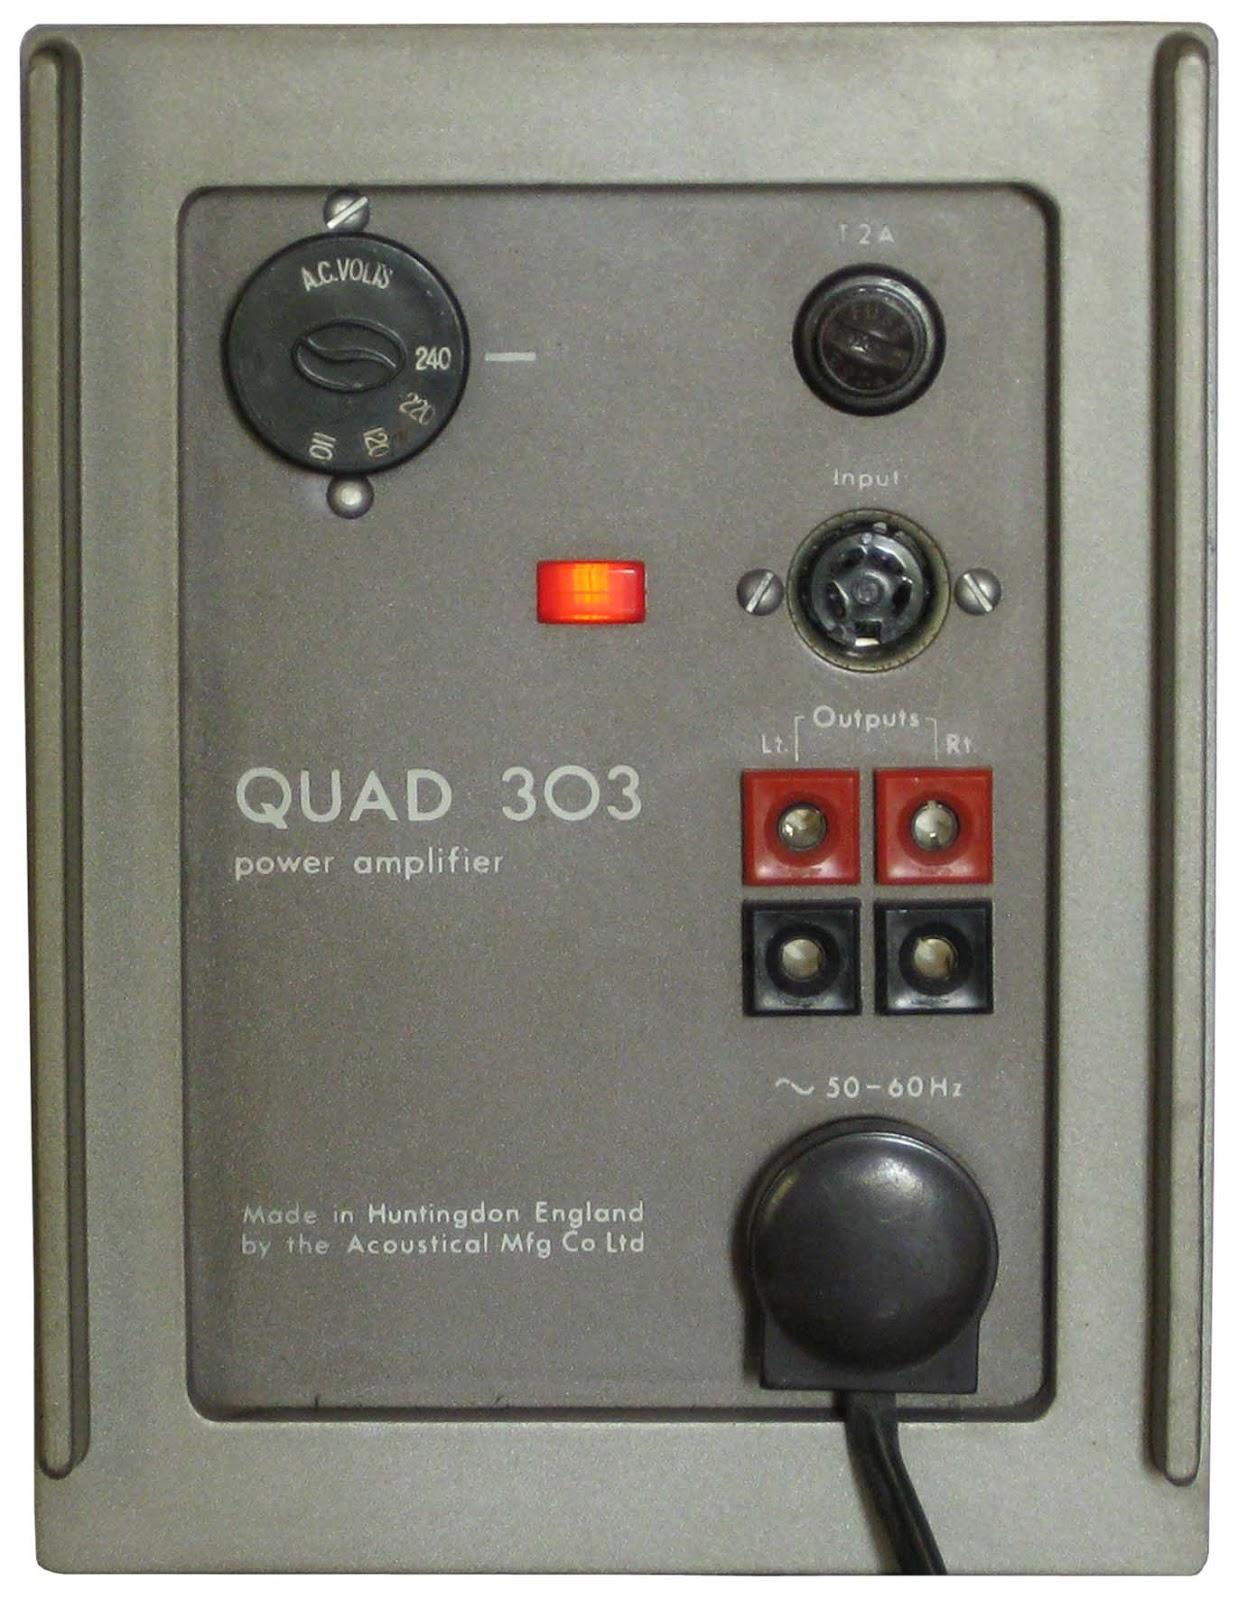 rare manual depository the quad 33 control amplifier the quad 303 rh raremanualdepository blogspot com FM3 Performance Marketing FM3 Performance Marketing